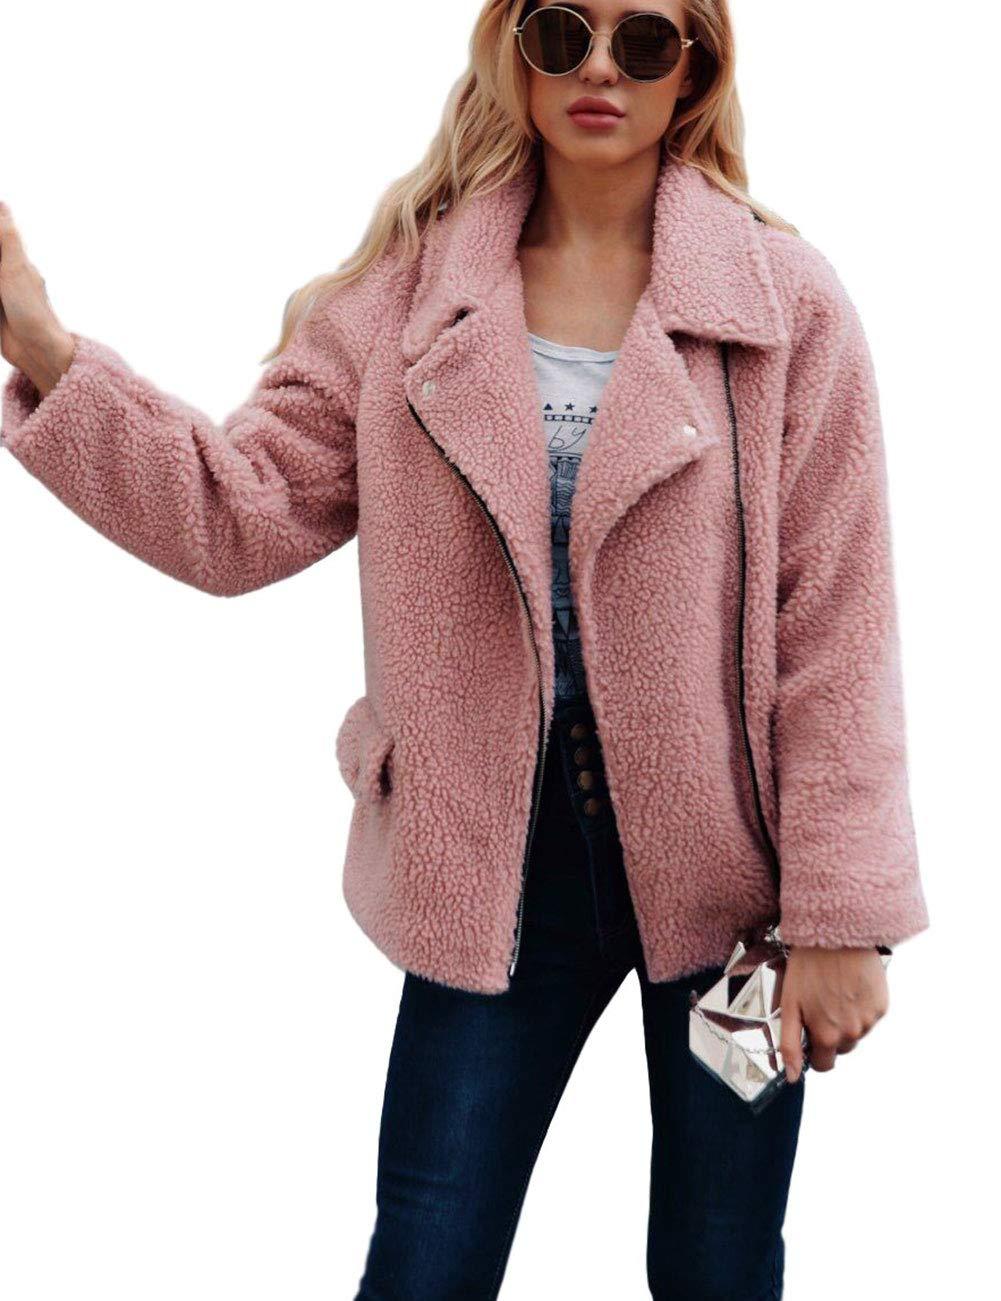 ZLSLZ Womens Ladies Cute Faux Fur Loose Furry Lapel Long Sleeve Event Zip Jacket Pink US L